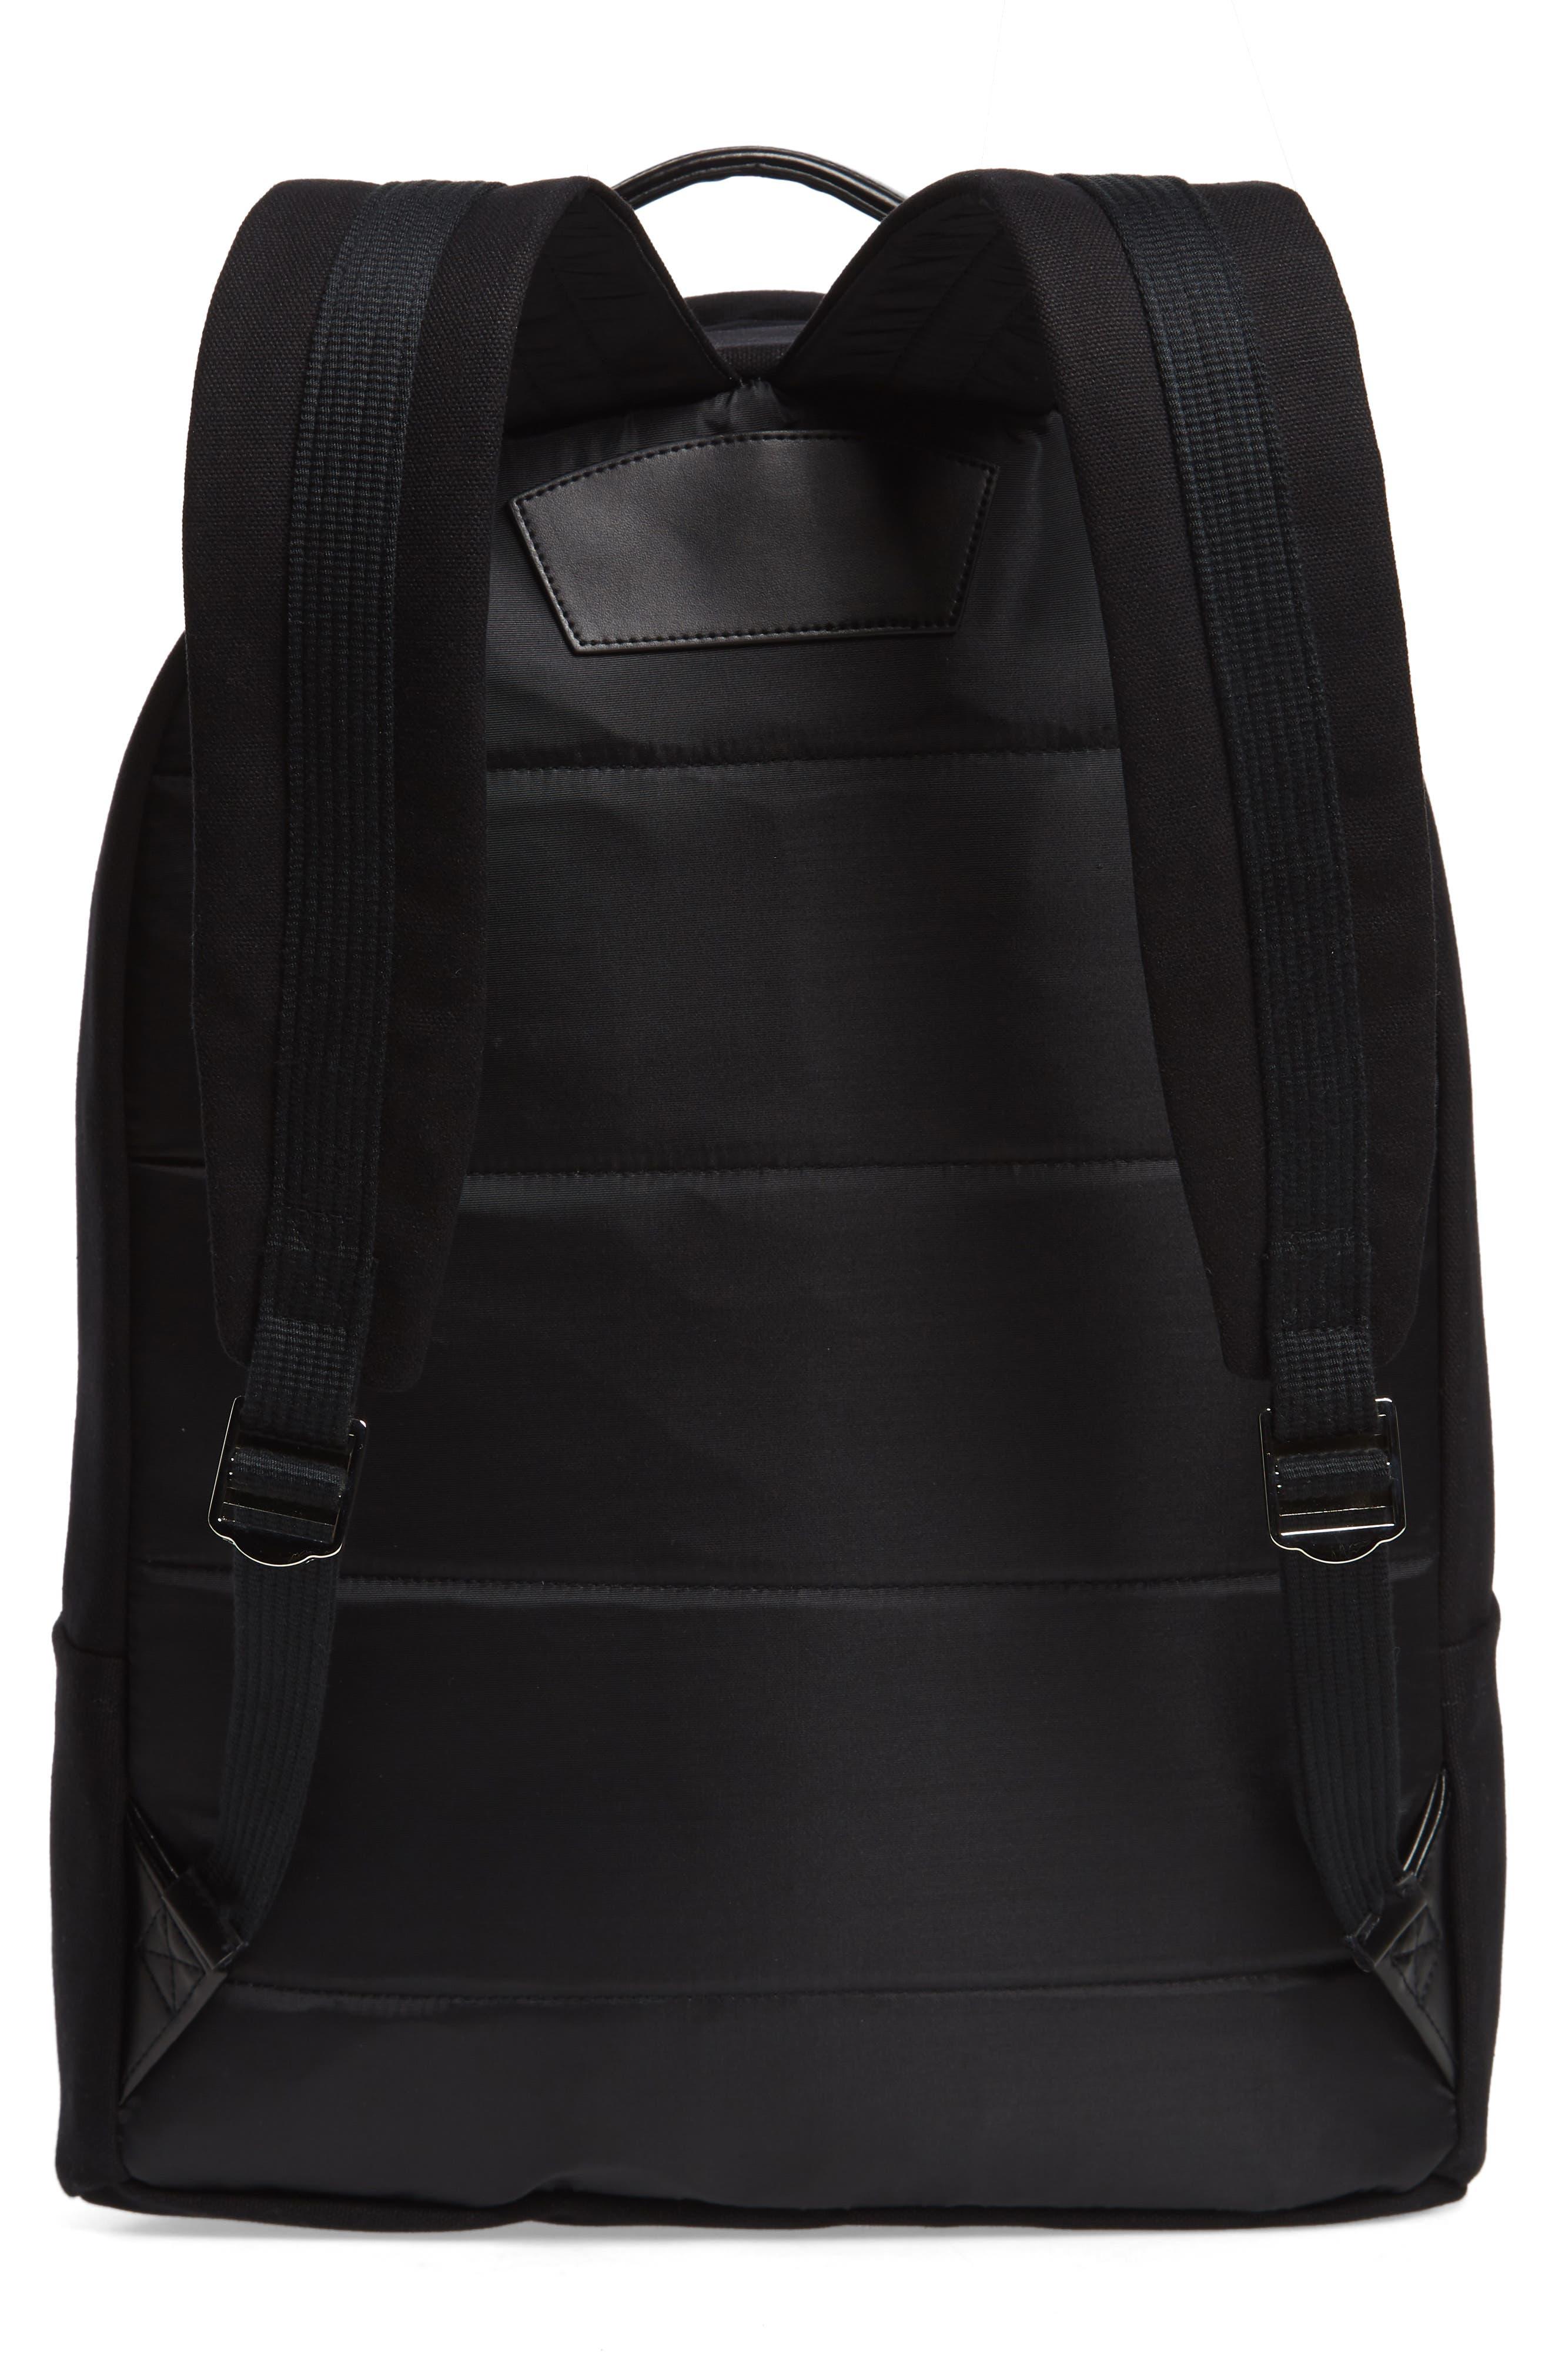 SATURDAYS NYC, Hannes Water Repellent Backpack, Alternate thumbnail 4, color, BLACK